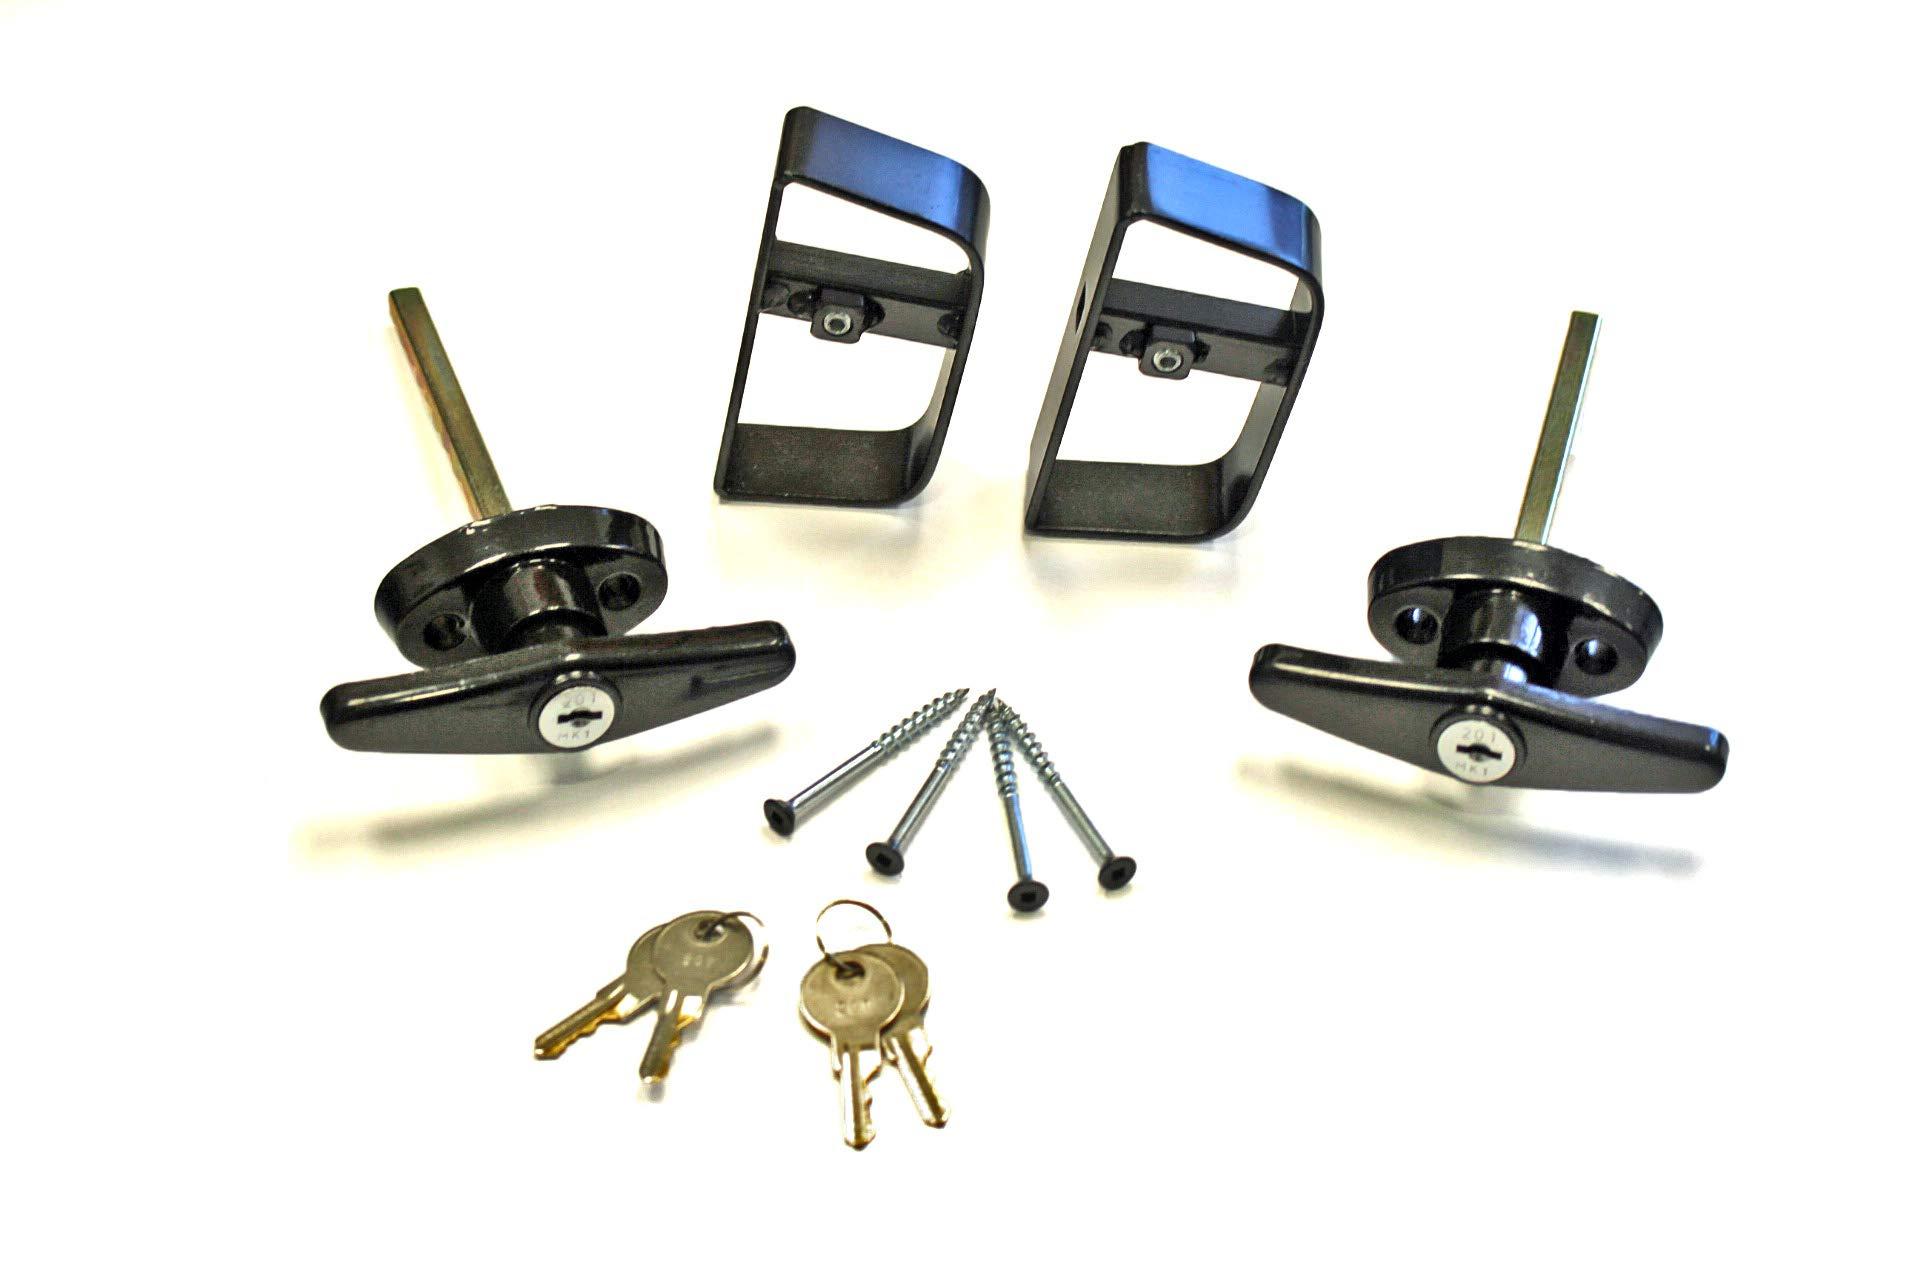 Doors & Door Hardware 4-1/2'' Black T Handle Door Lock Set - For shed, gate, playhouse, (2) KEYED ALIKE